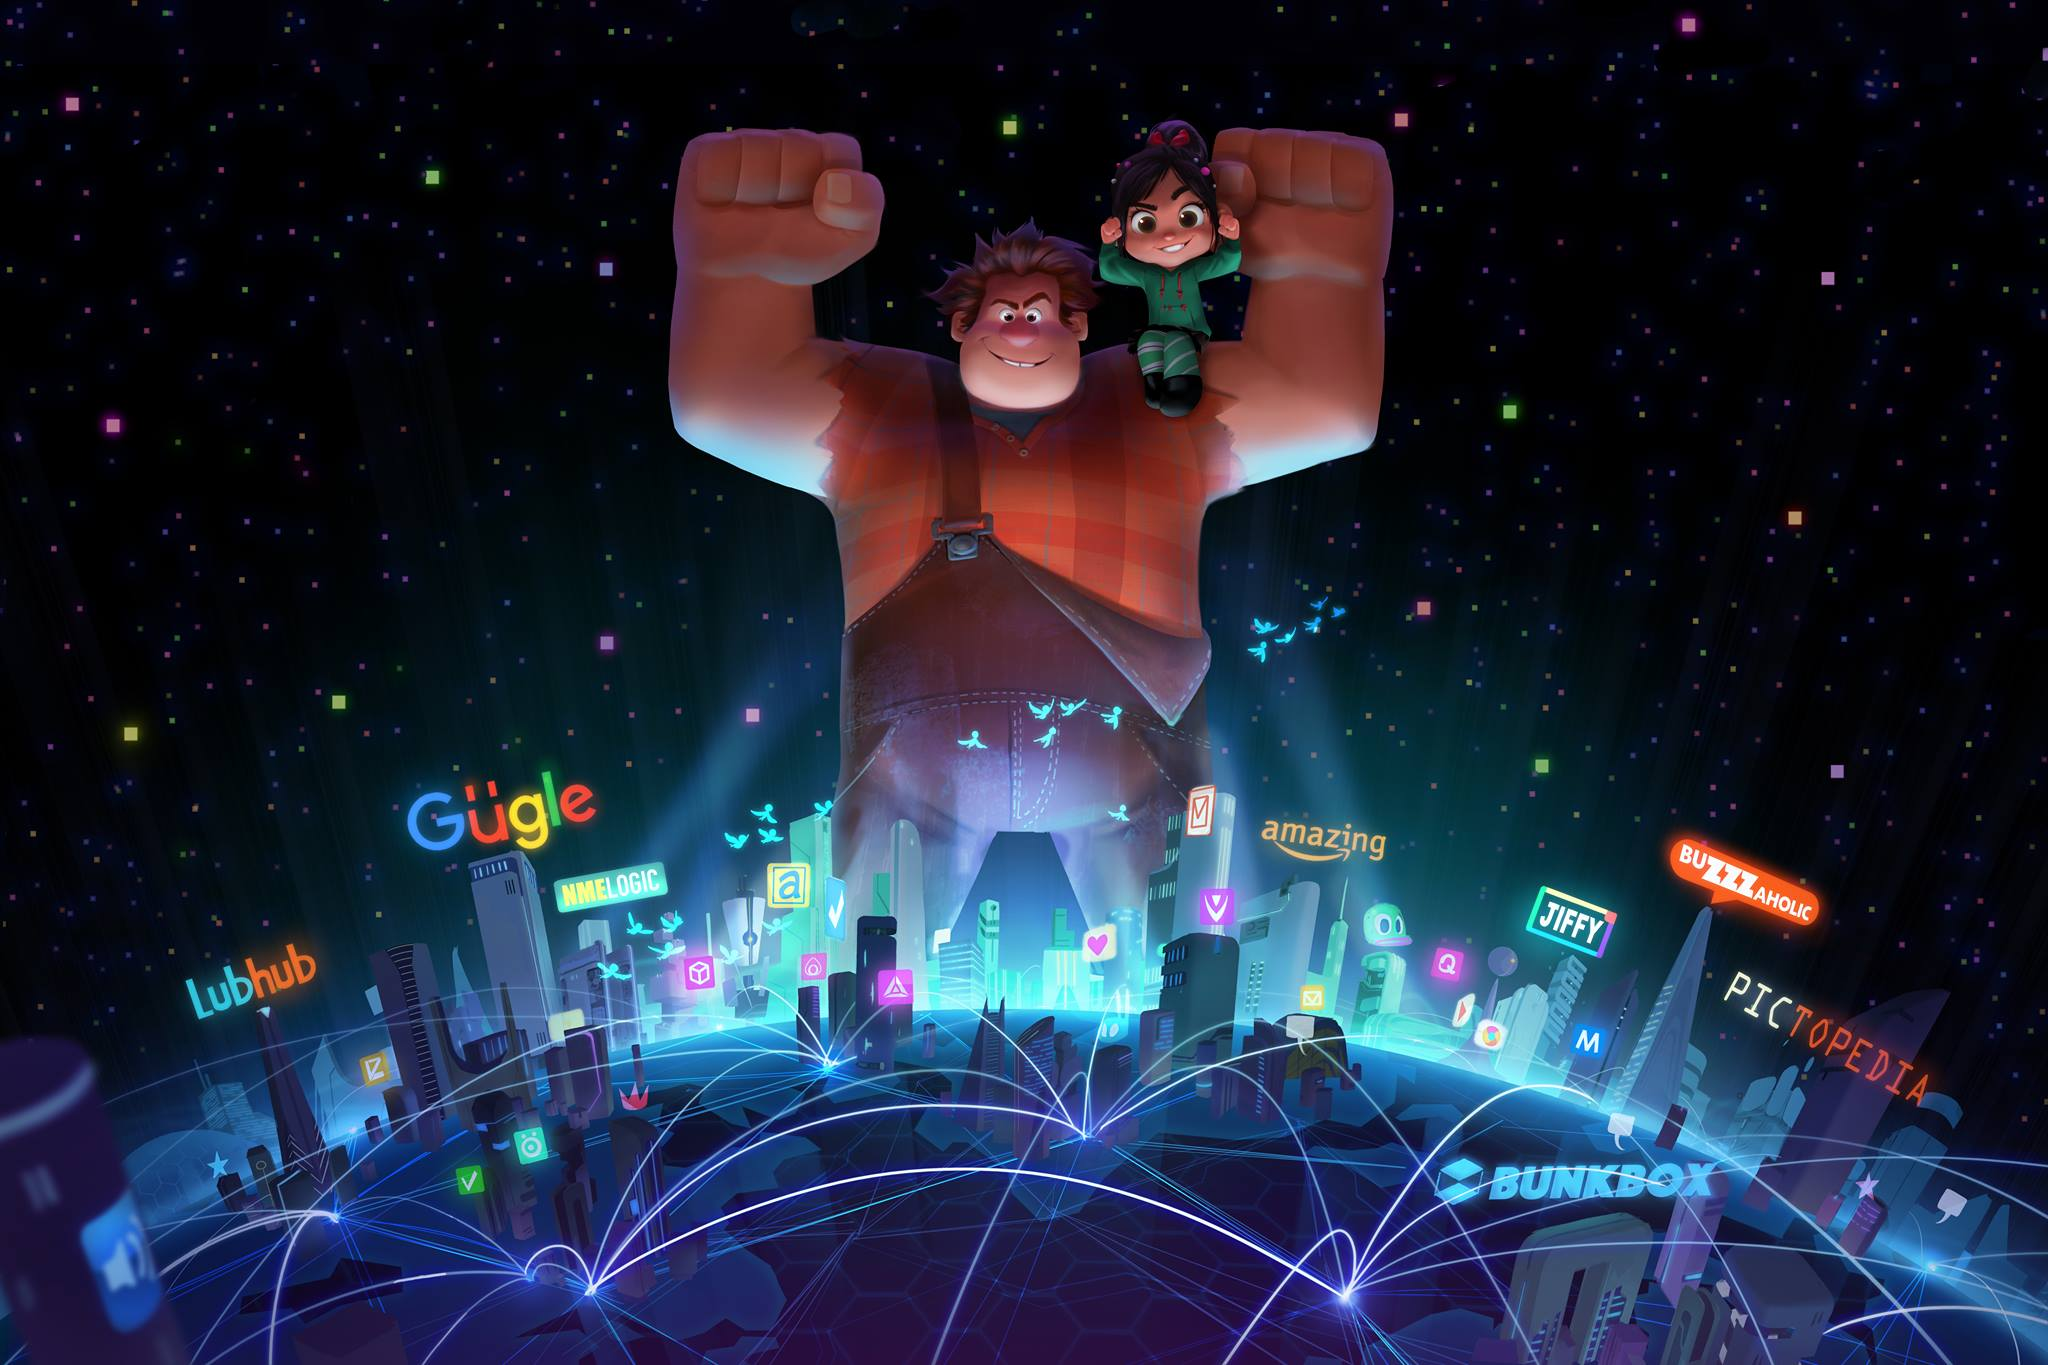 File:Wreck it Ralph 2 Official First Look.jpg